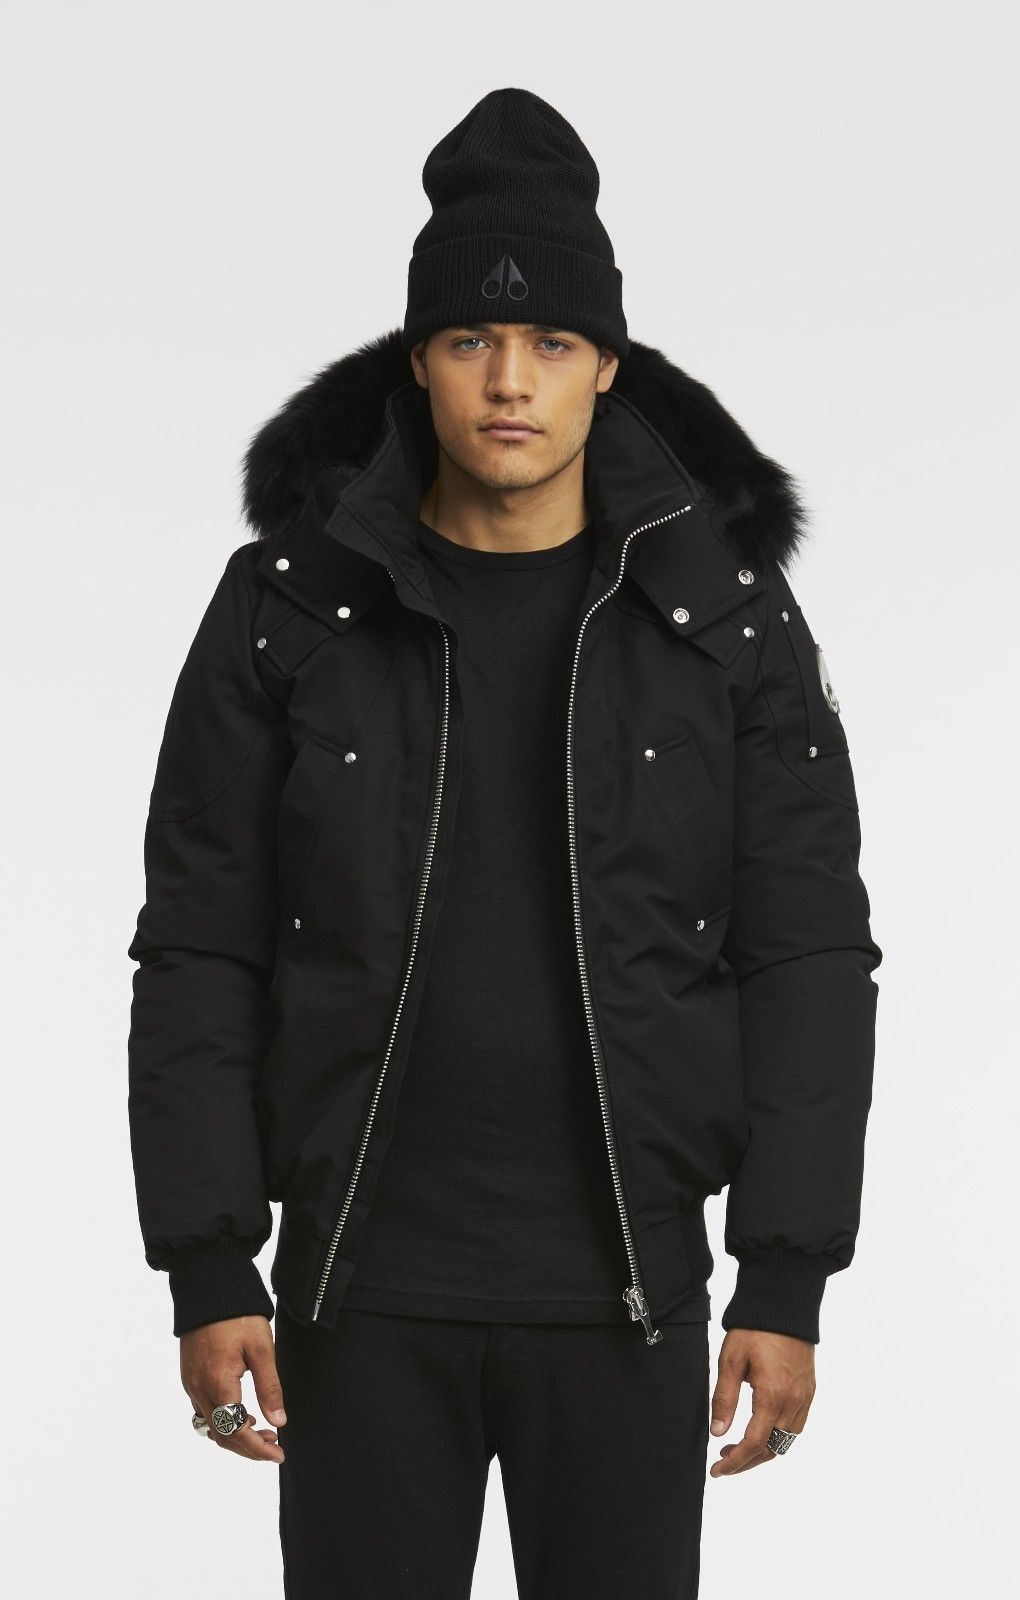 795 Moose Knuckles Ballistic Bomber Mens Hooded Fur Trim Black Jacket Size M Jackets Mens Winter Fashion Trim Jacket [ 1600 x 1020 Pixel ]